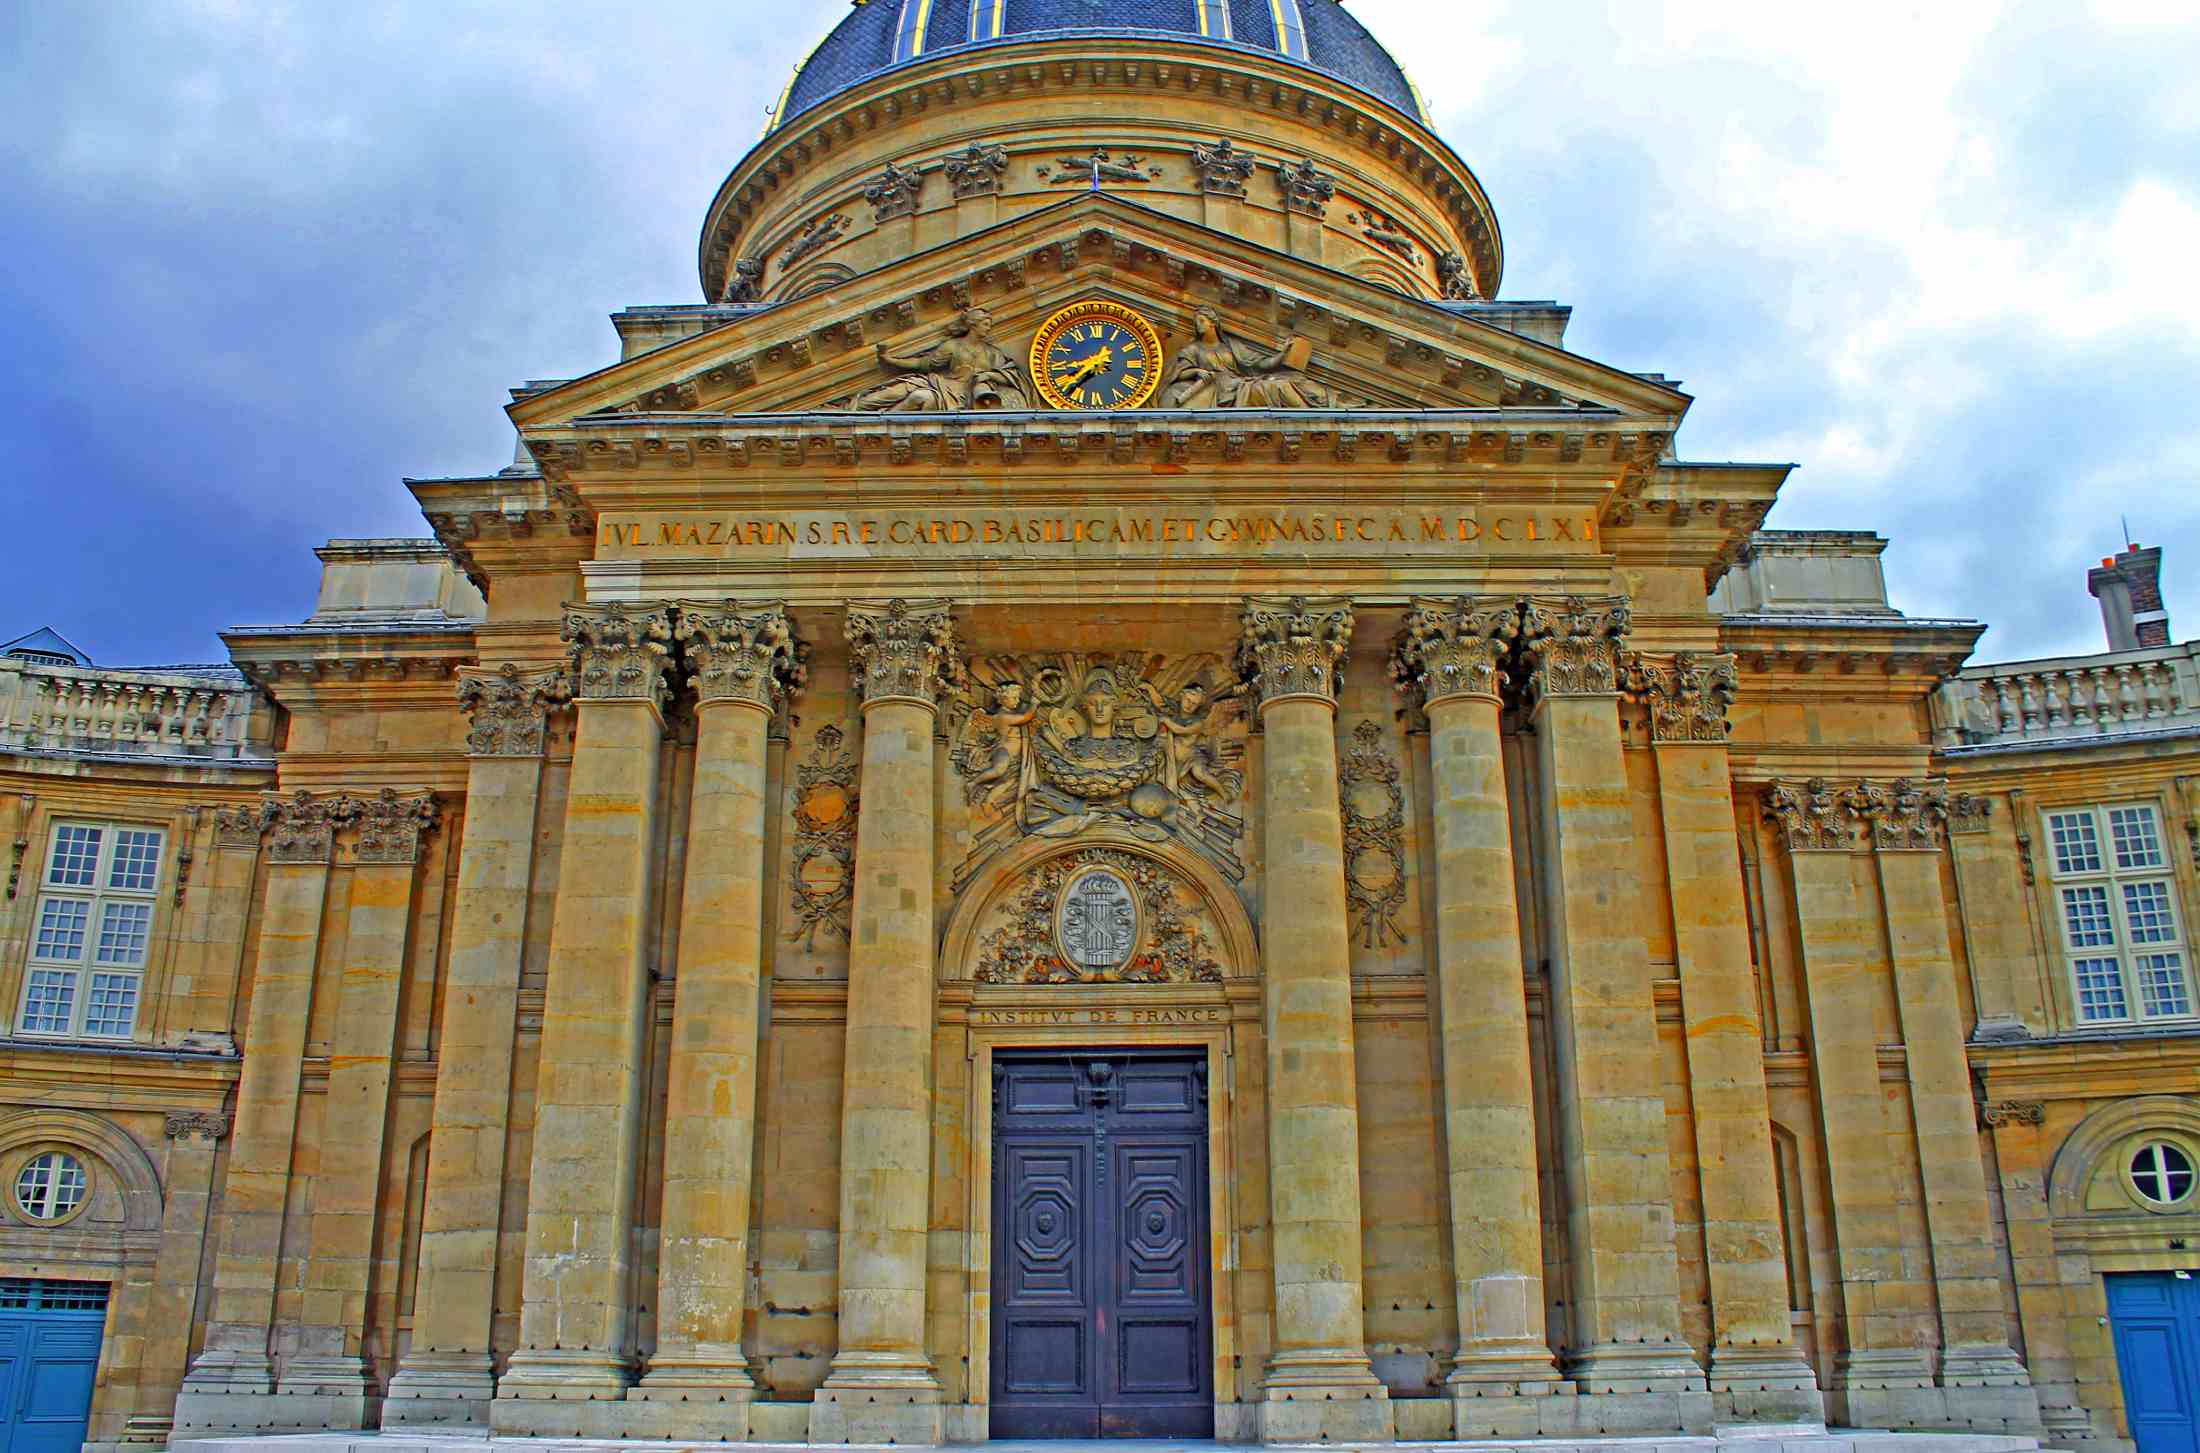 Institut de France - Focal Journey